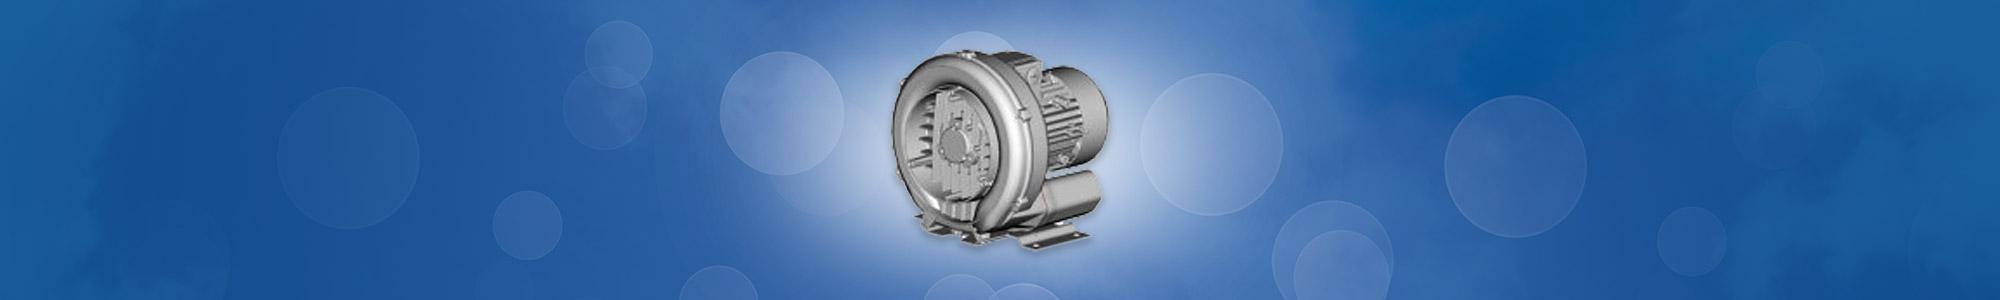 Side channel blower compressor